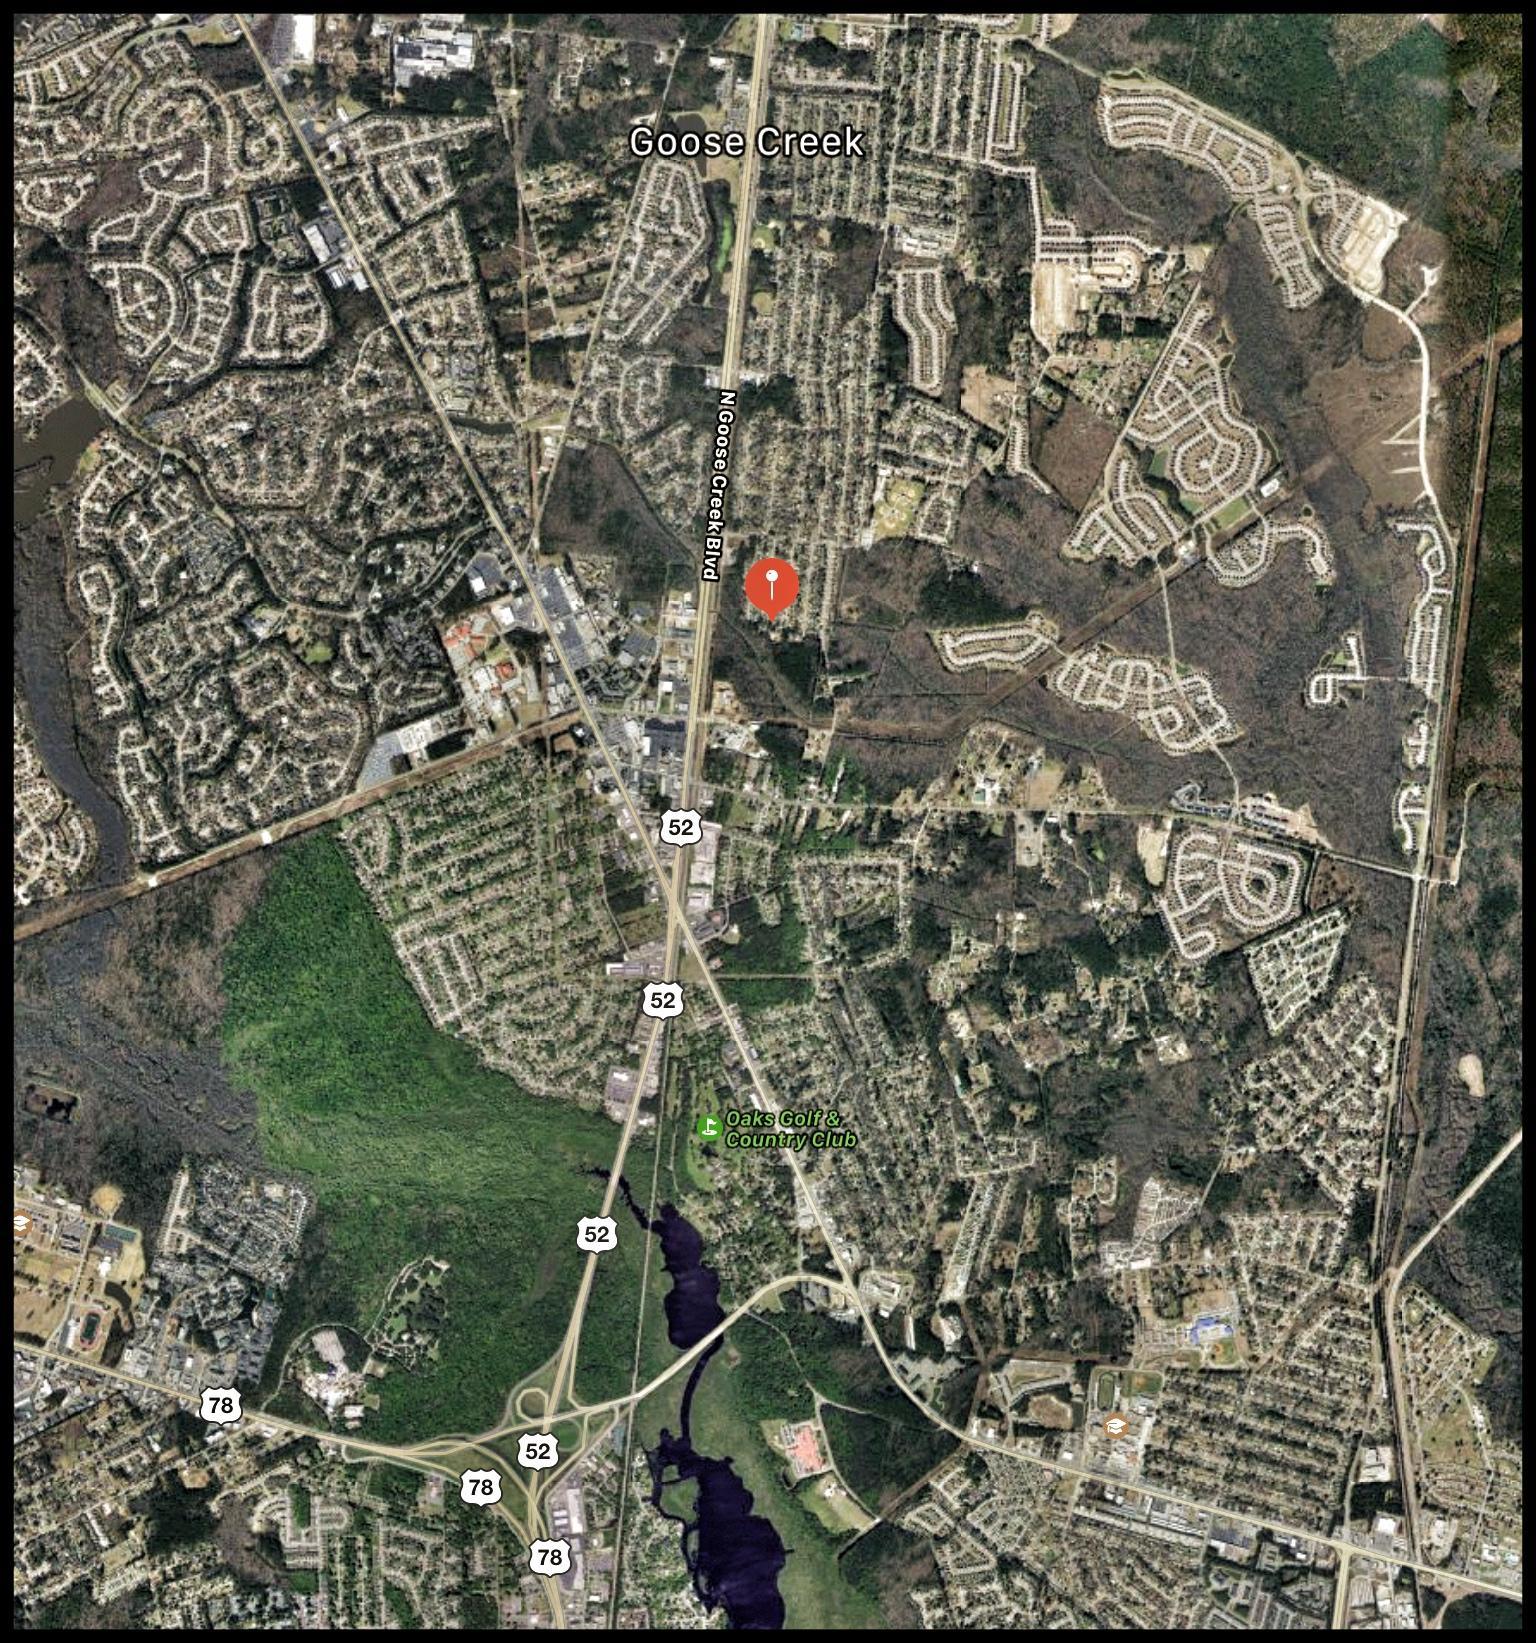 108 Kathryn Drive Goose Creek, Sc 29445